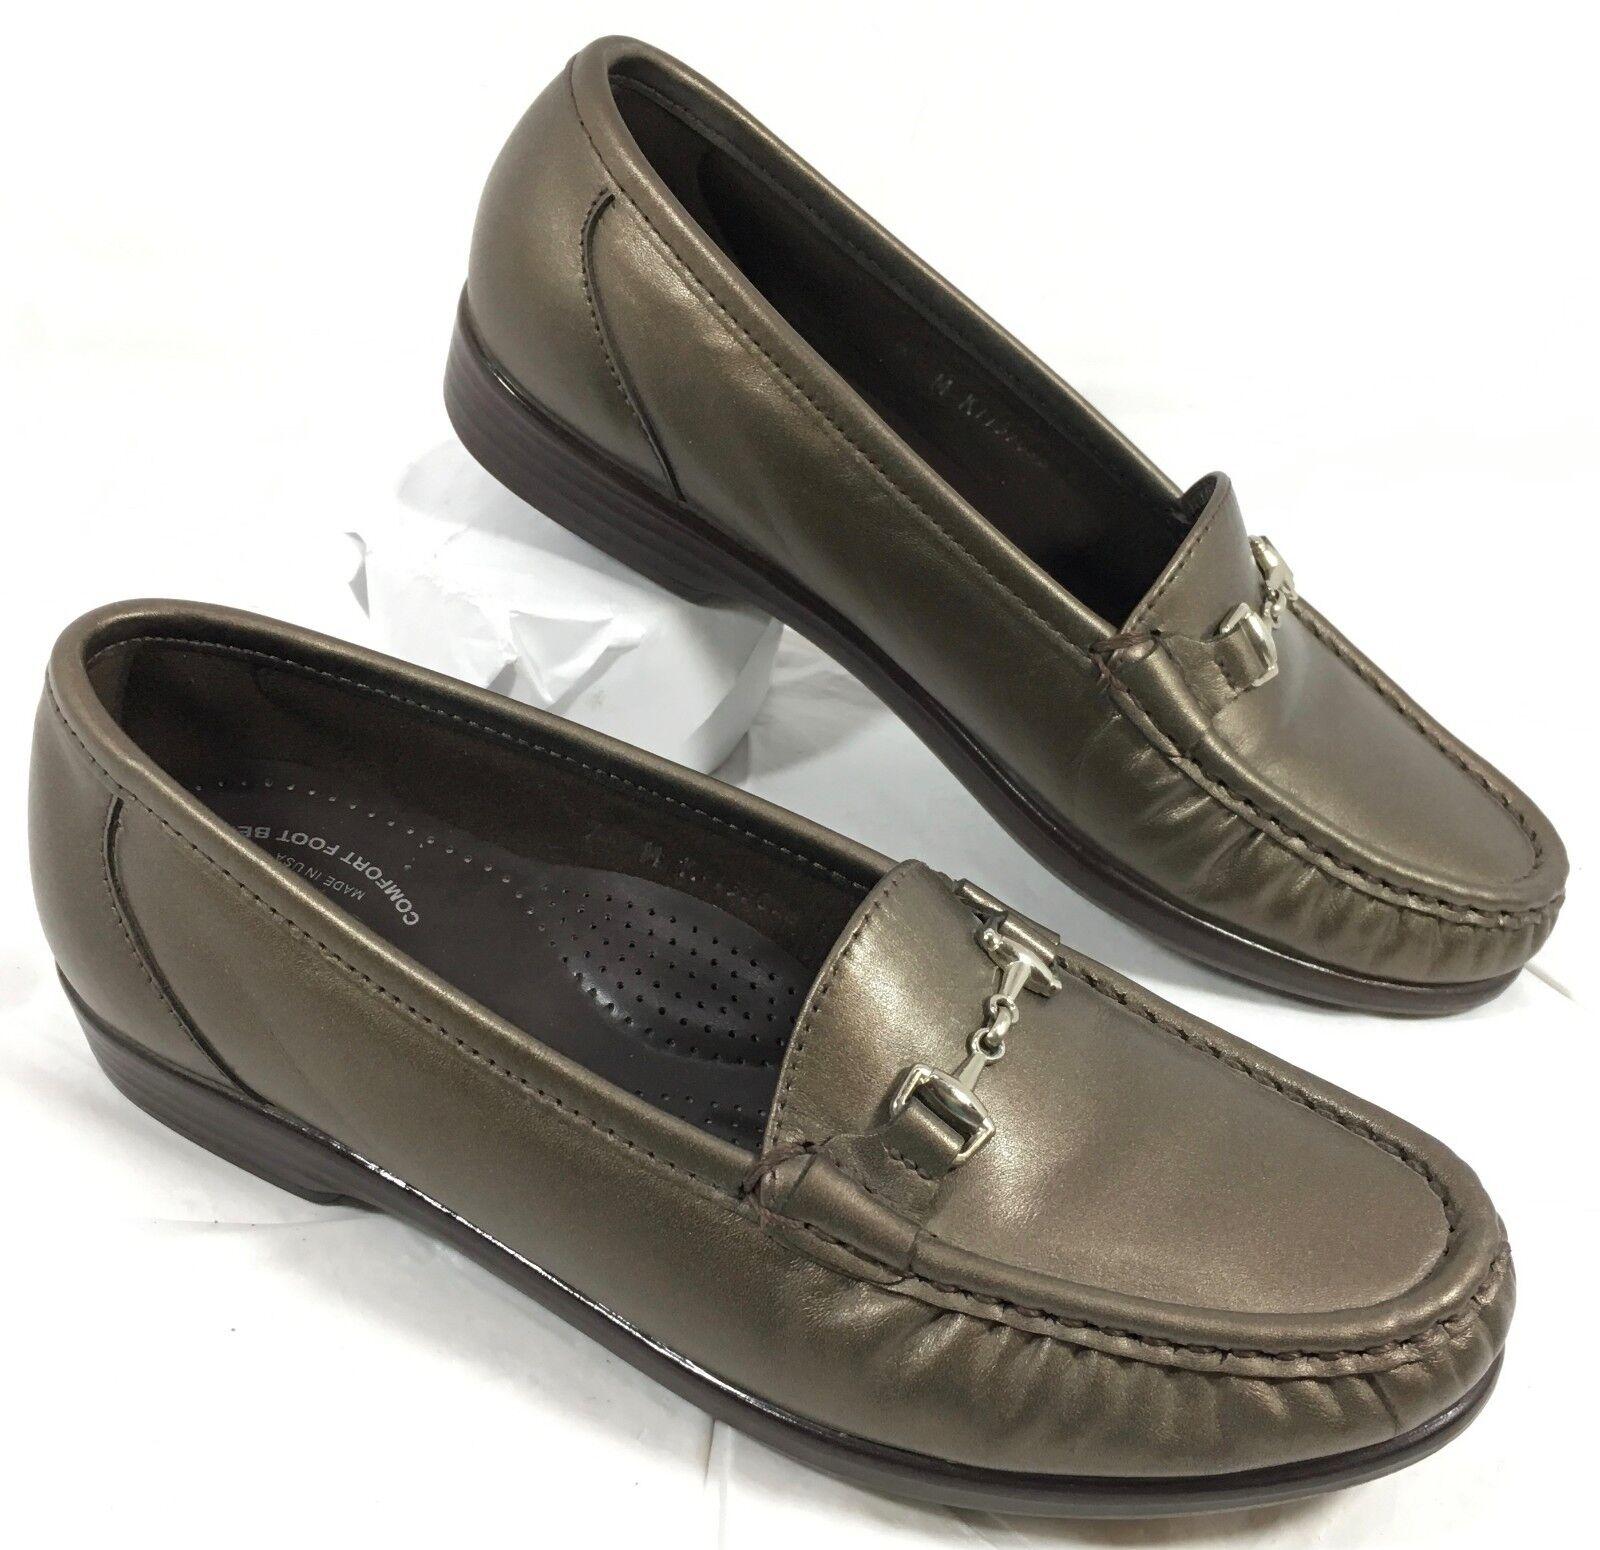 GUC Women's SAS METRO Bronze brown Leather Loafers M w/ Bit Sz 7 M Loafers 8f5e22